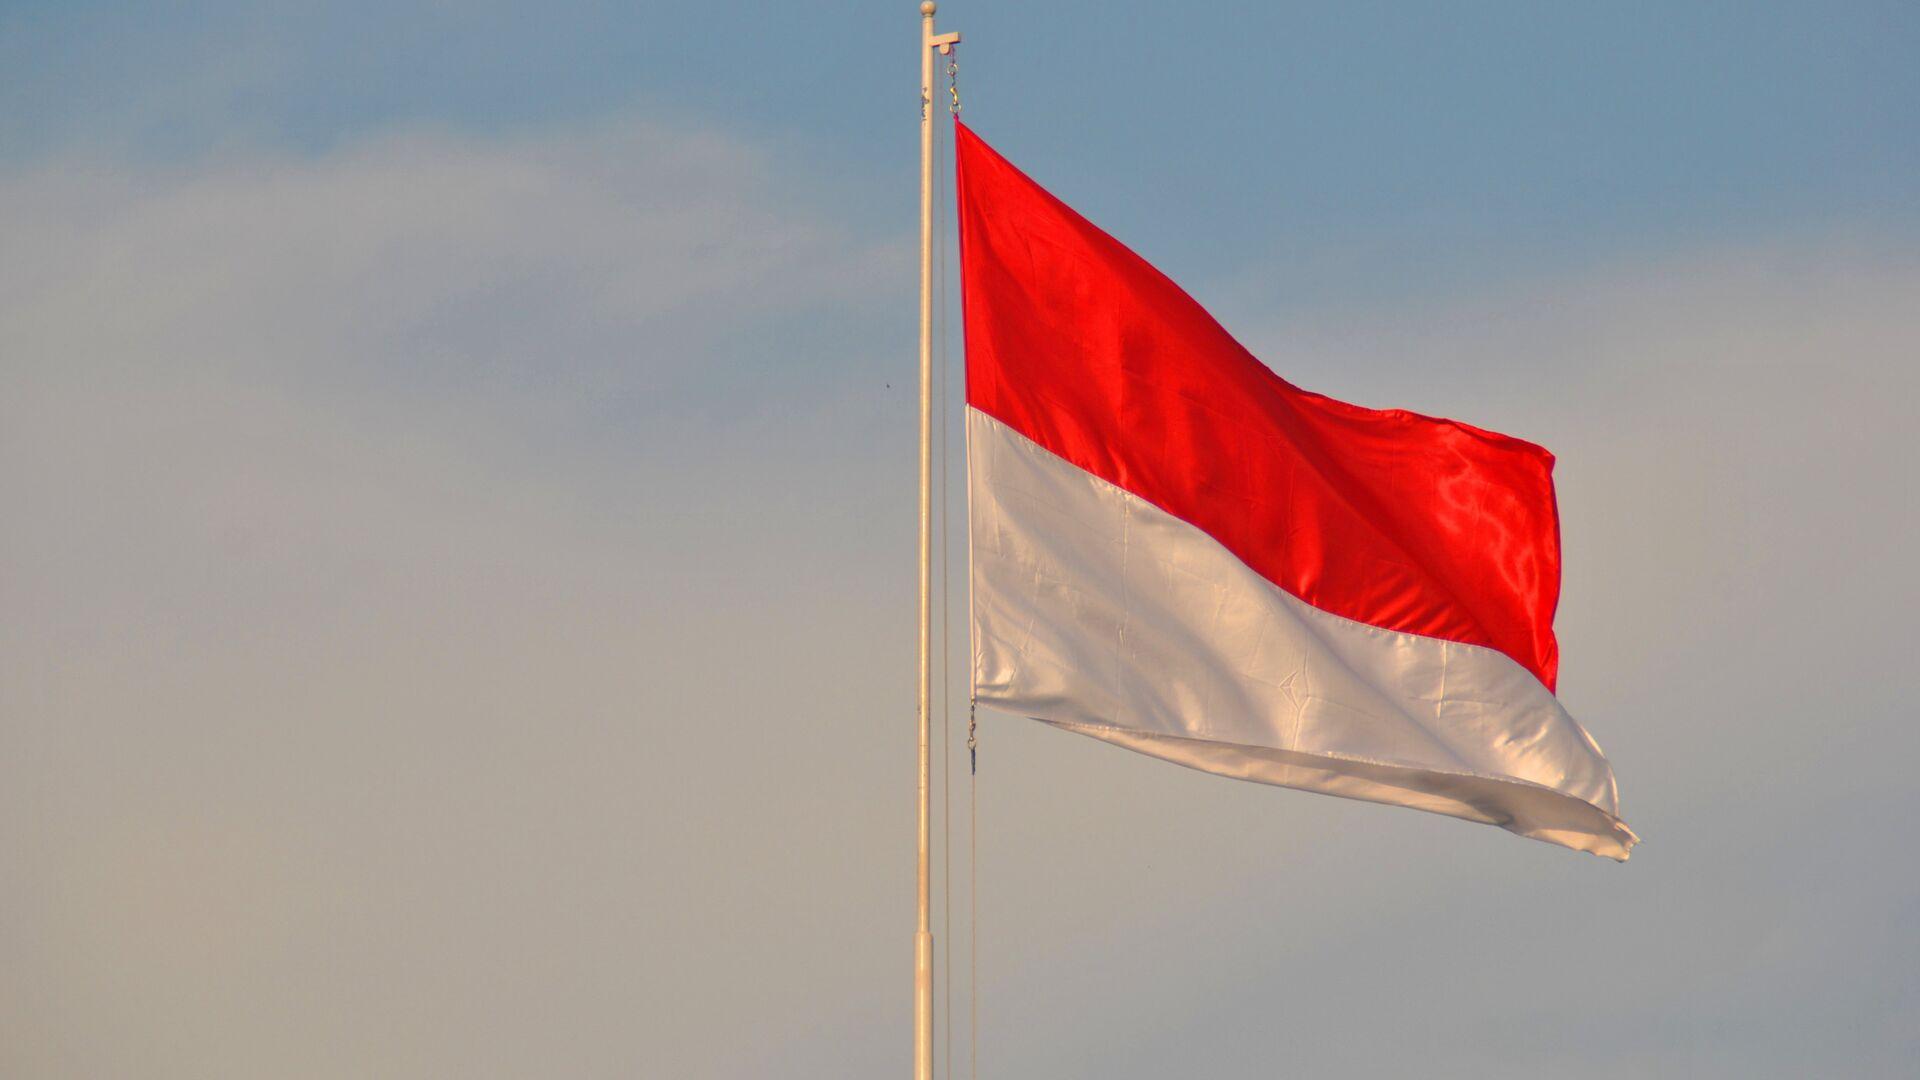 Bandera de Indonesia - Sputnik Mundo, 1920, 06.07.2021